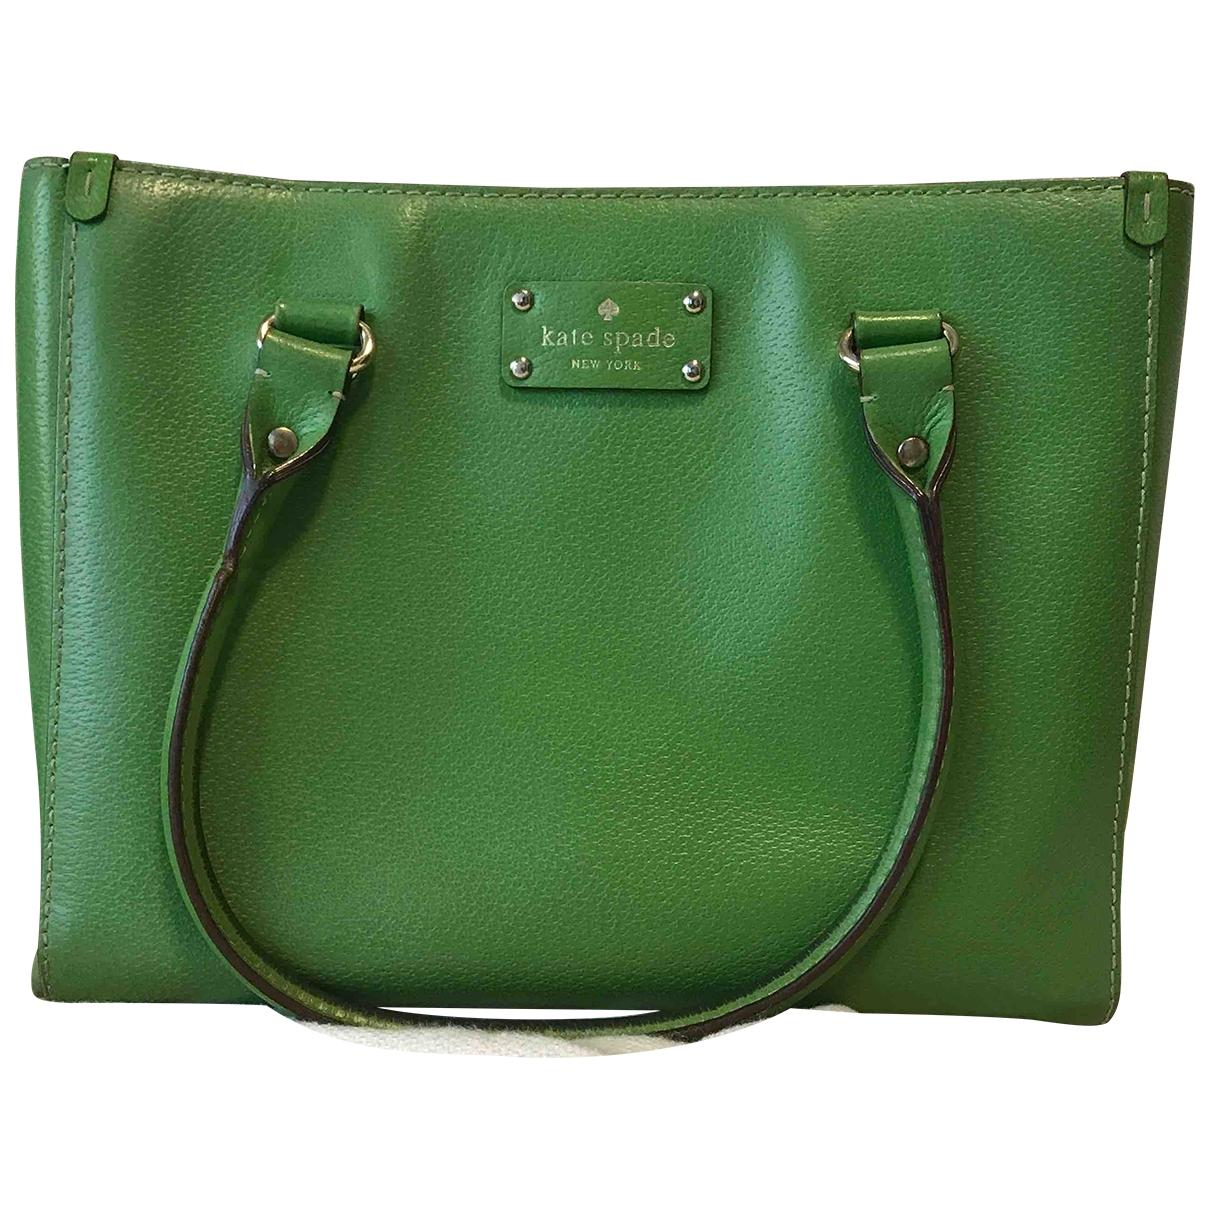 Kate Spade \N Green Leather handbag for Women \N